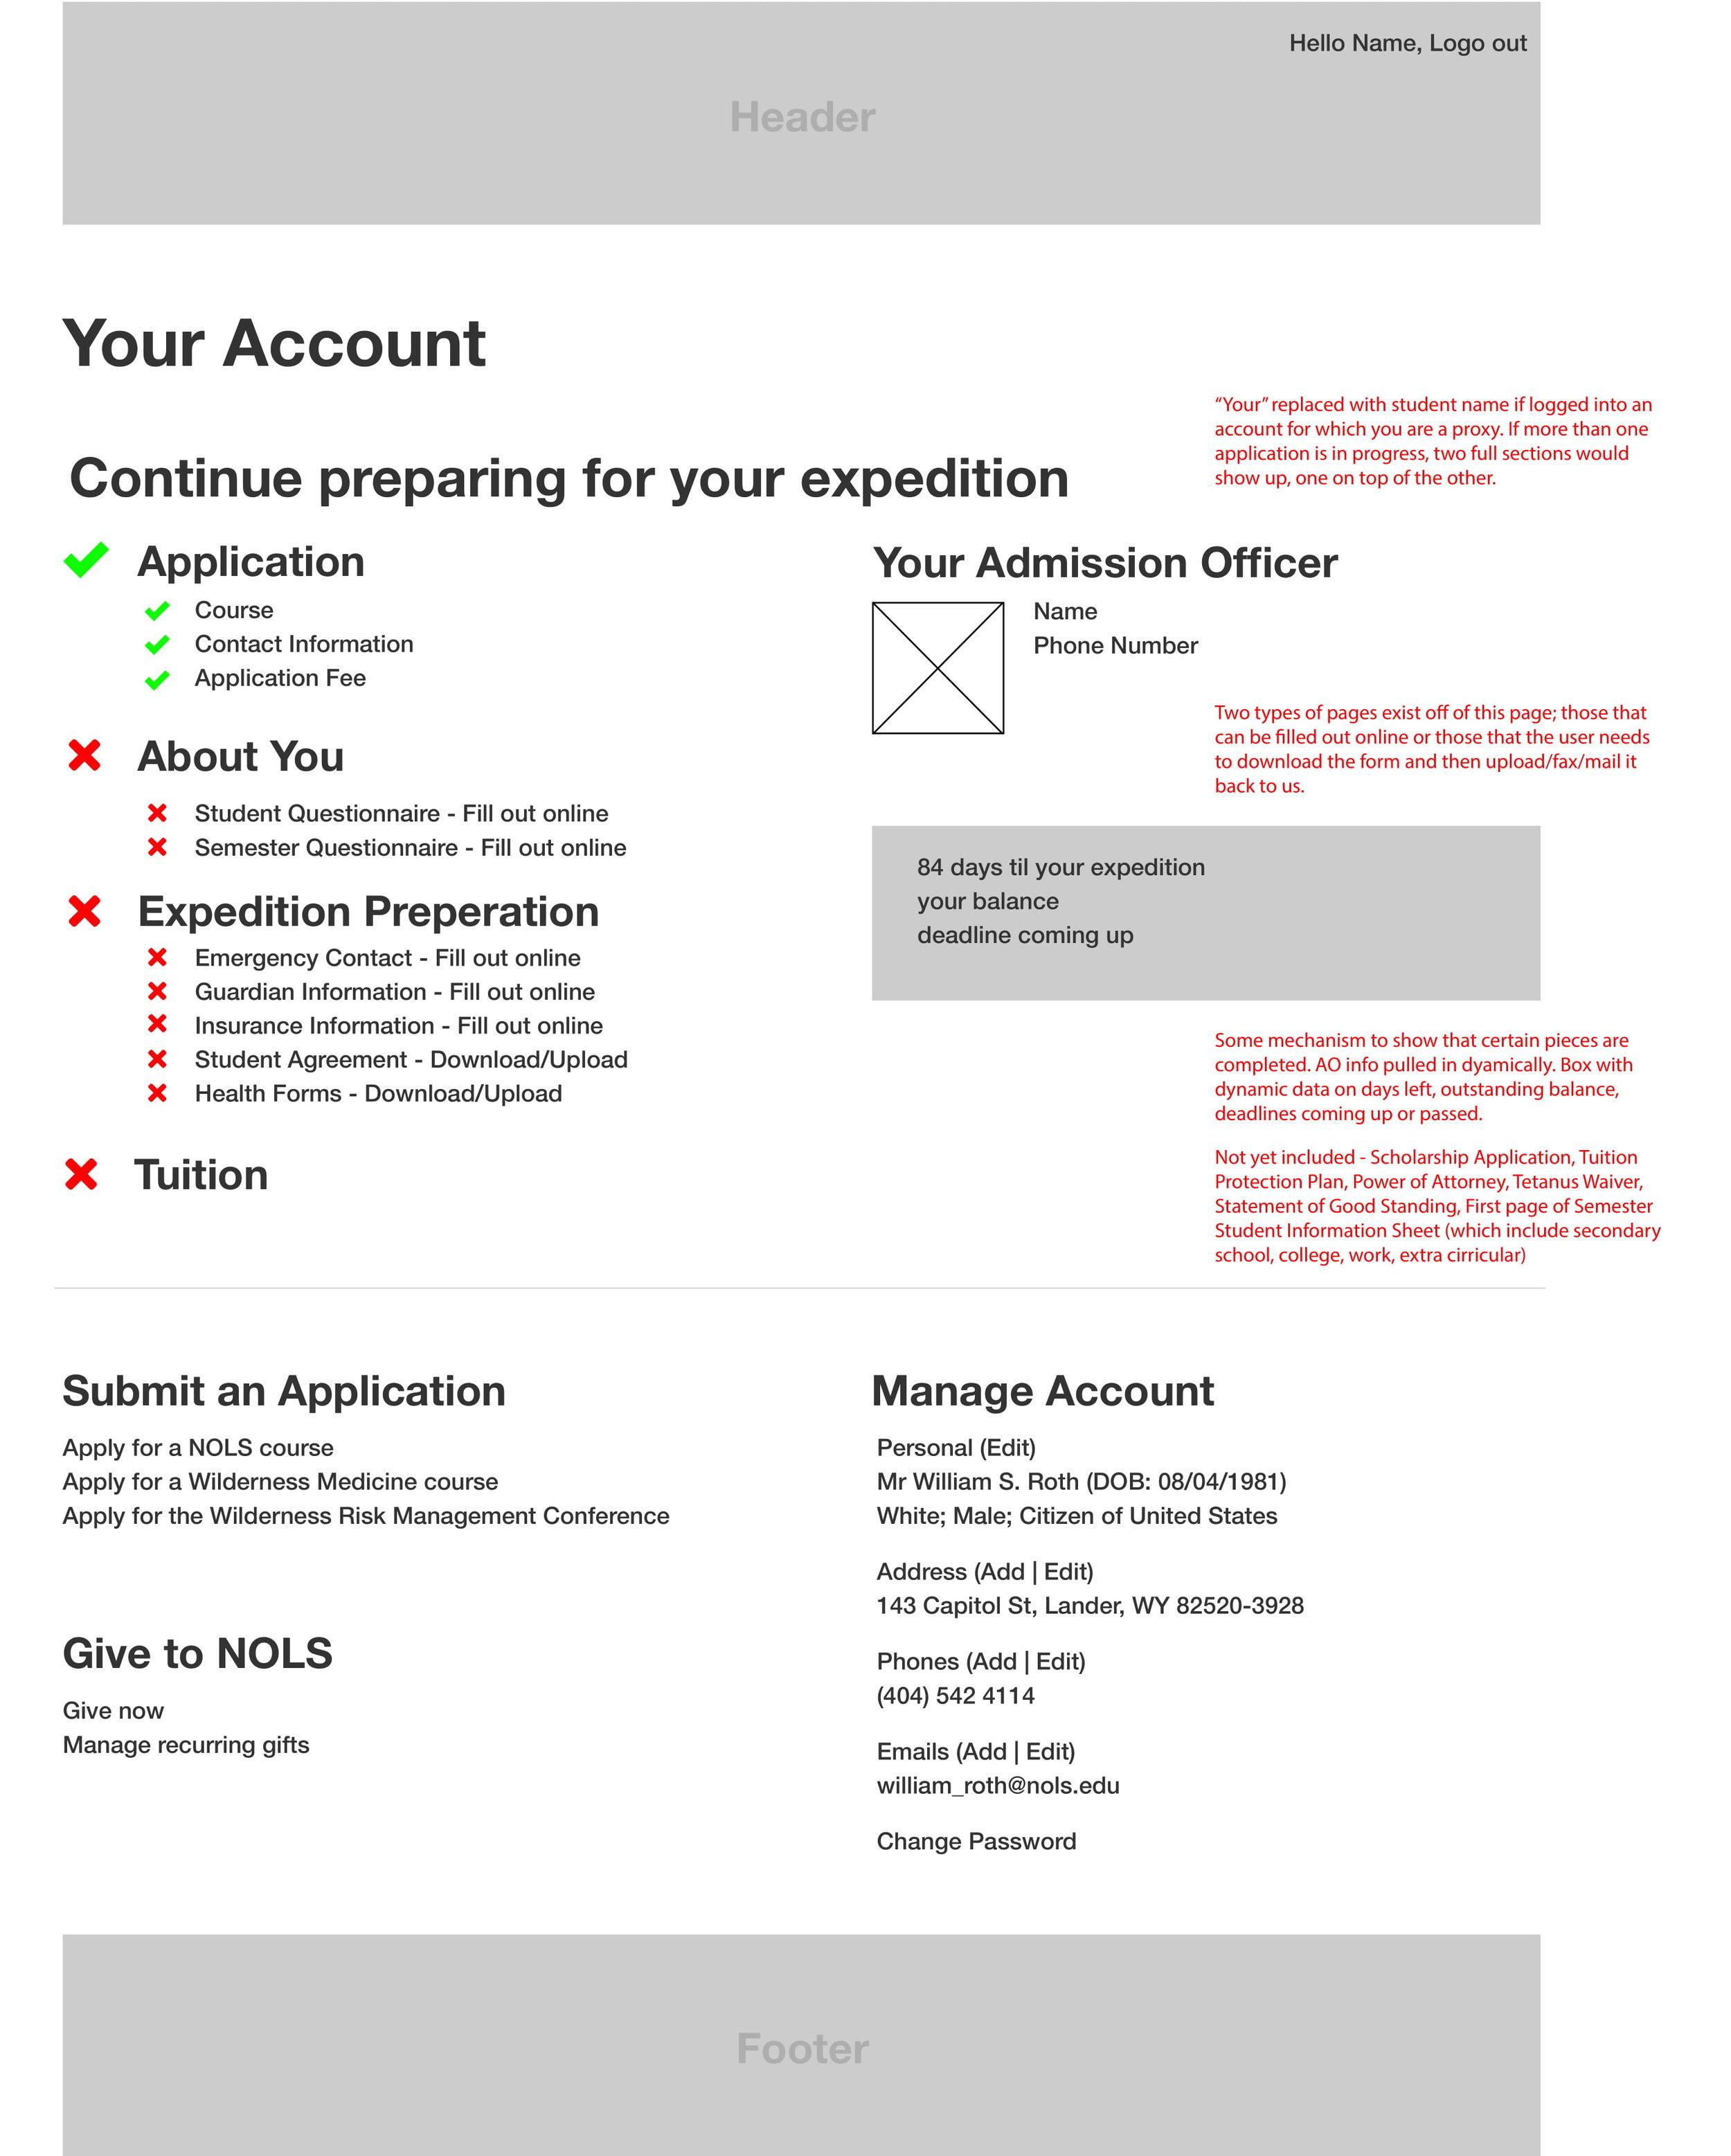 v5-application-wireframes-3-6-14-08.jpg